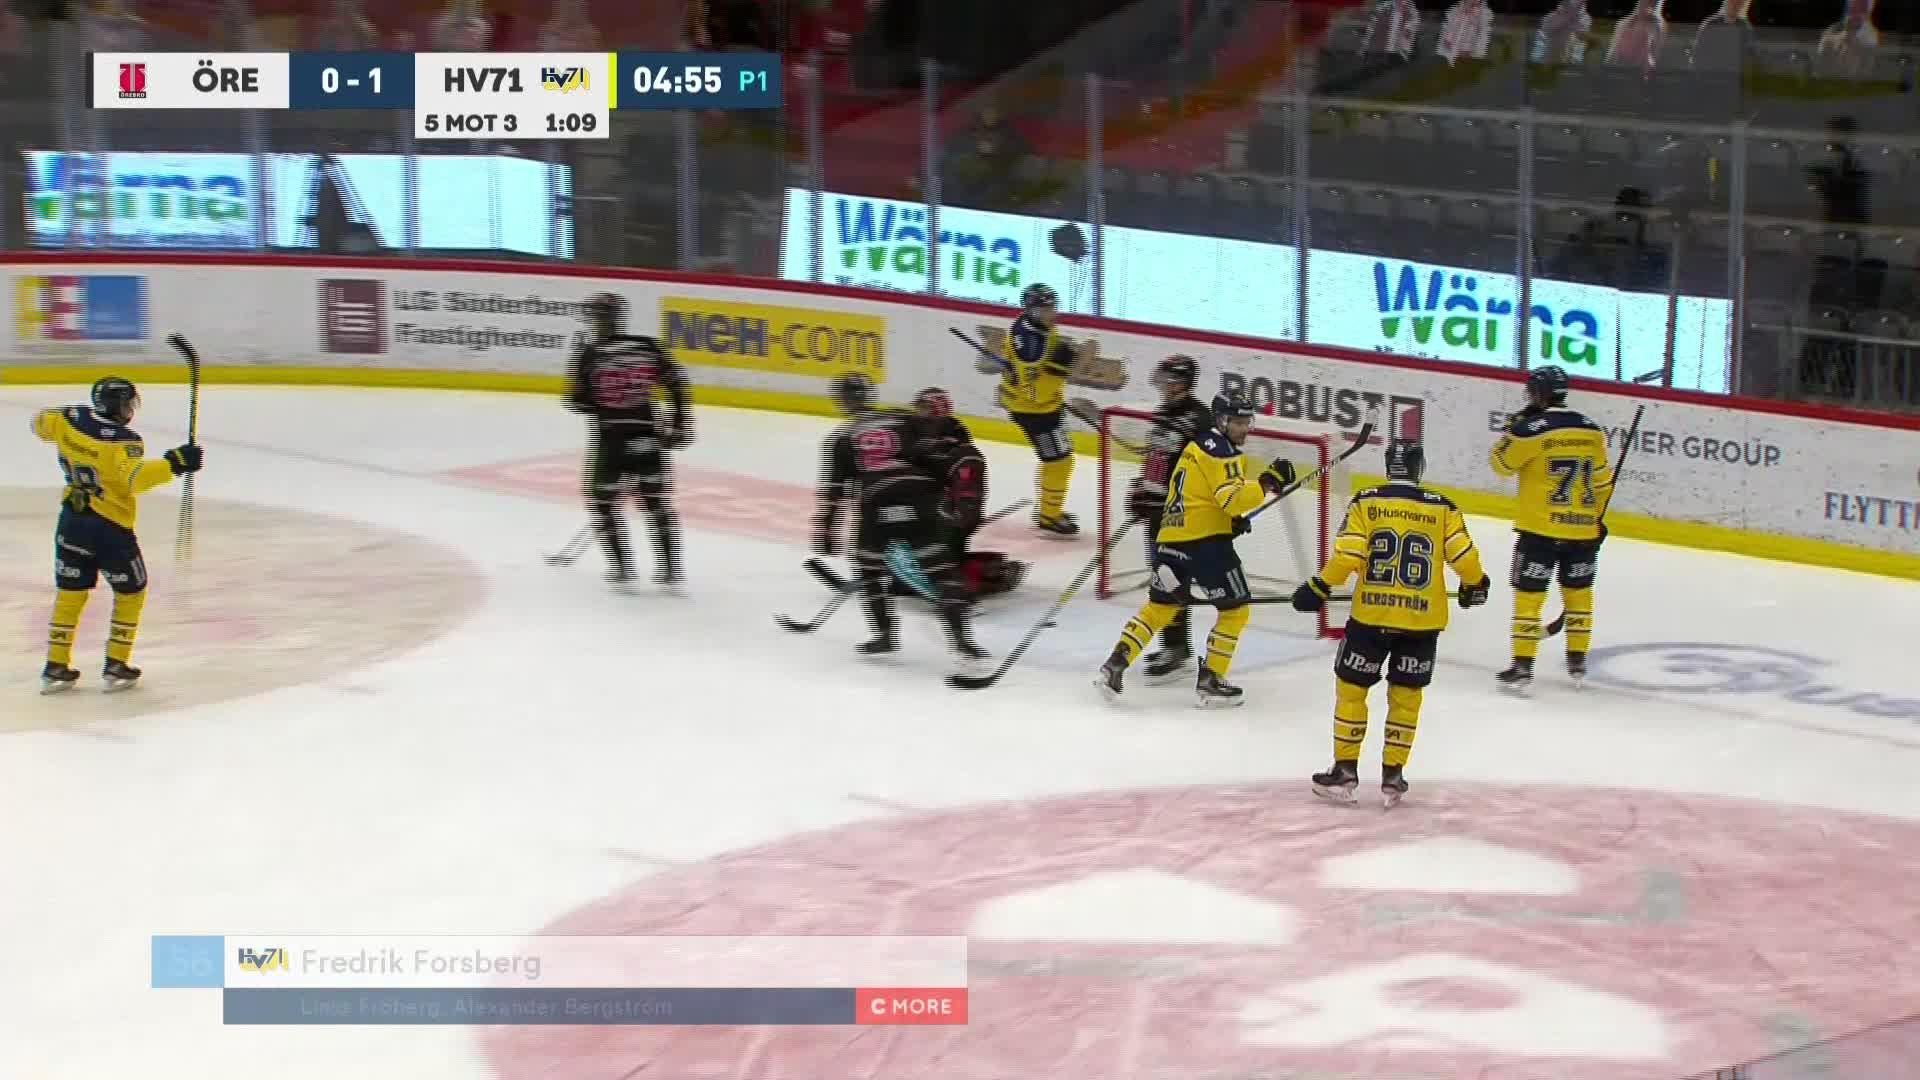 Örebro Hockey - HV71 0-2